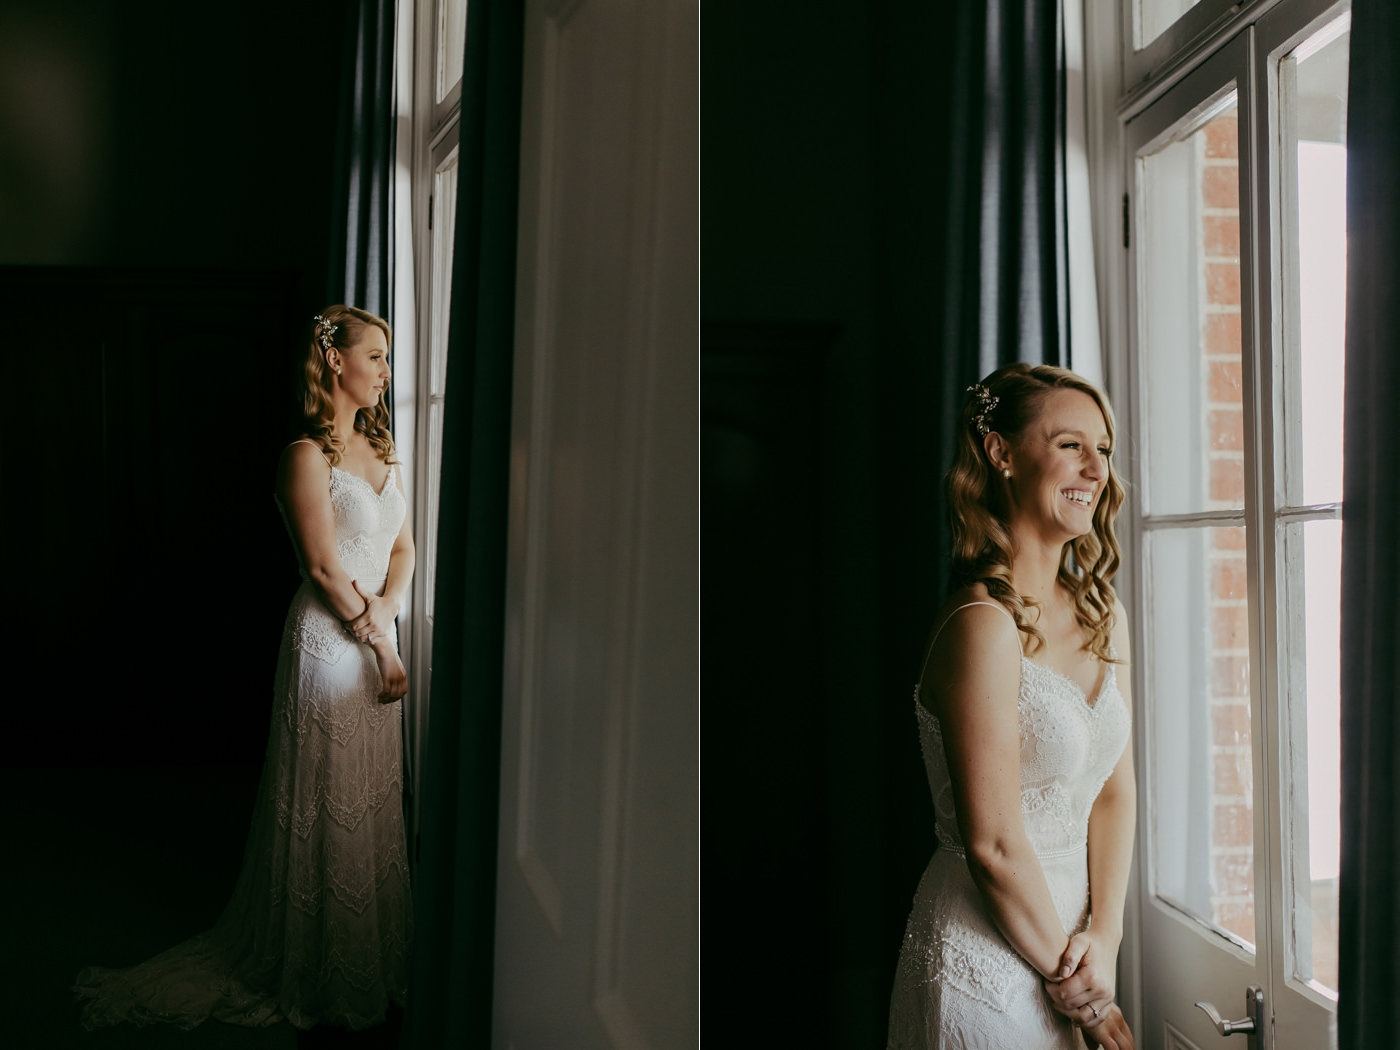 Anthony & Eliet - Wagga Wagga Wedding - Country NSW - Samantha Heather Photography-30.jpg